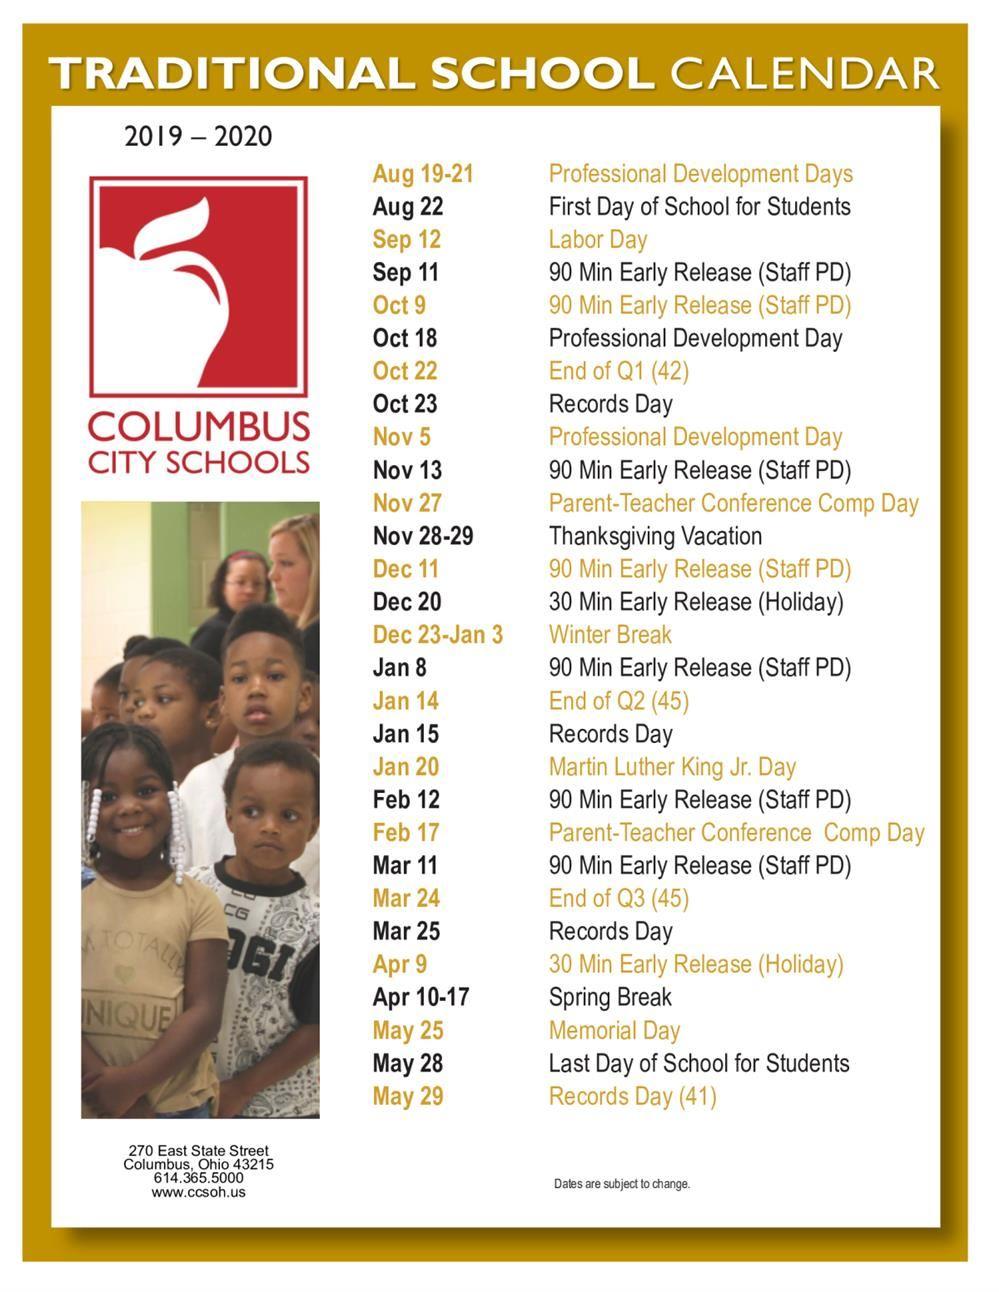 Columbus City Schools Calendar 2020 Arts Impact Middle School / Homepage